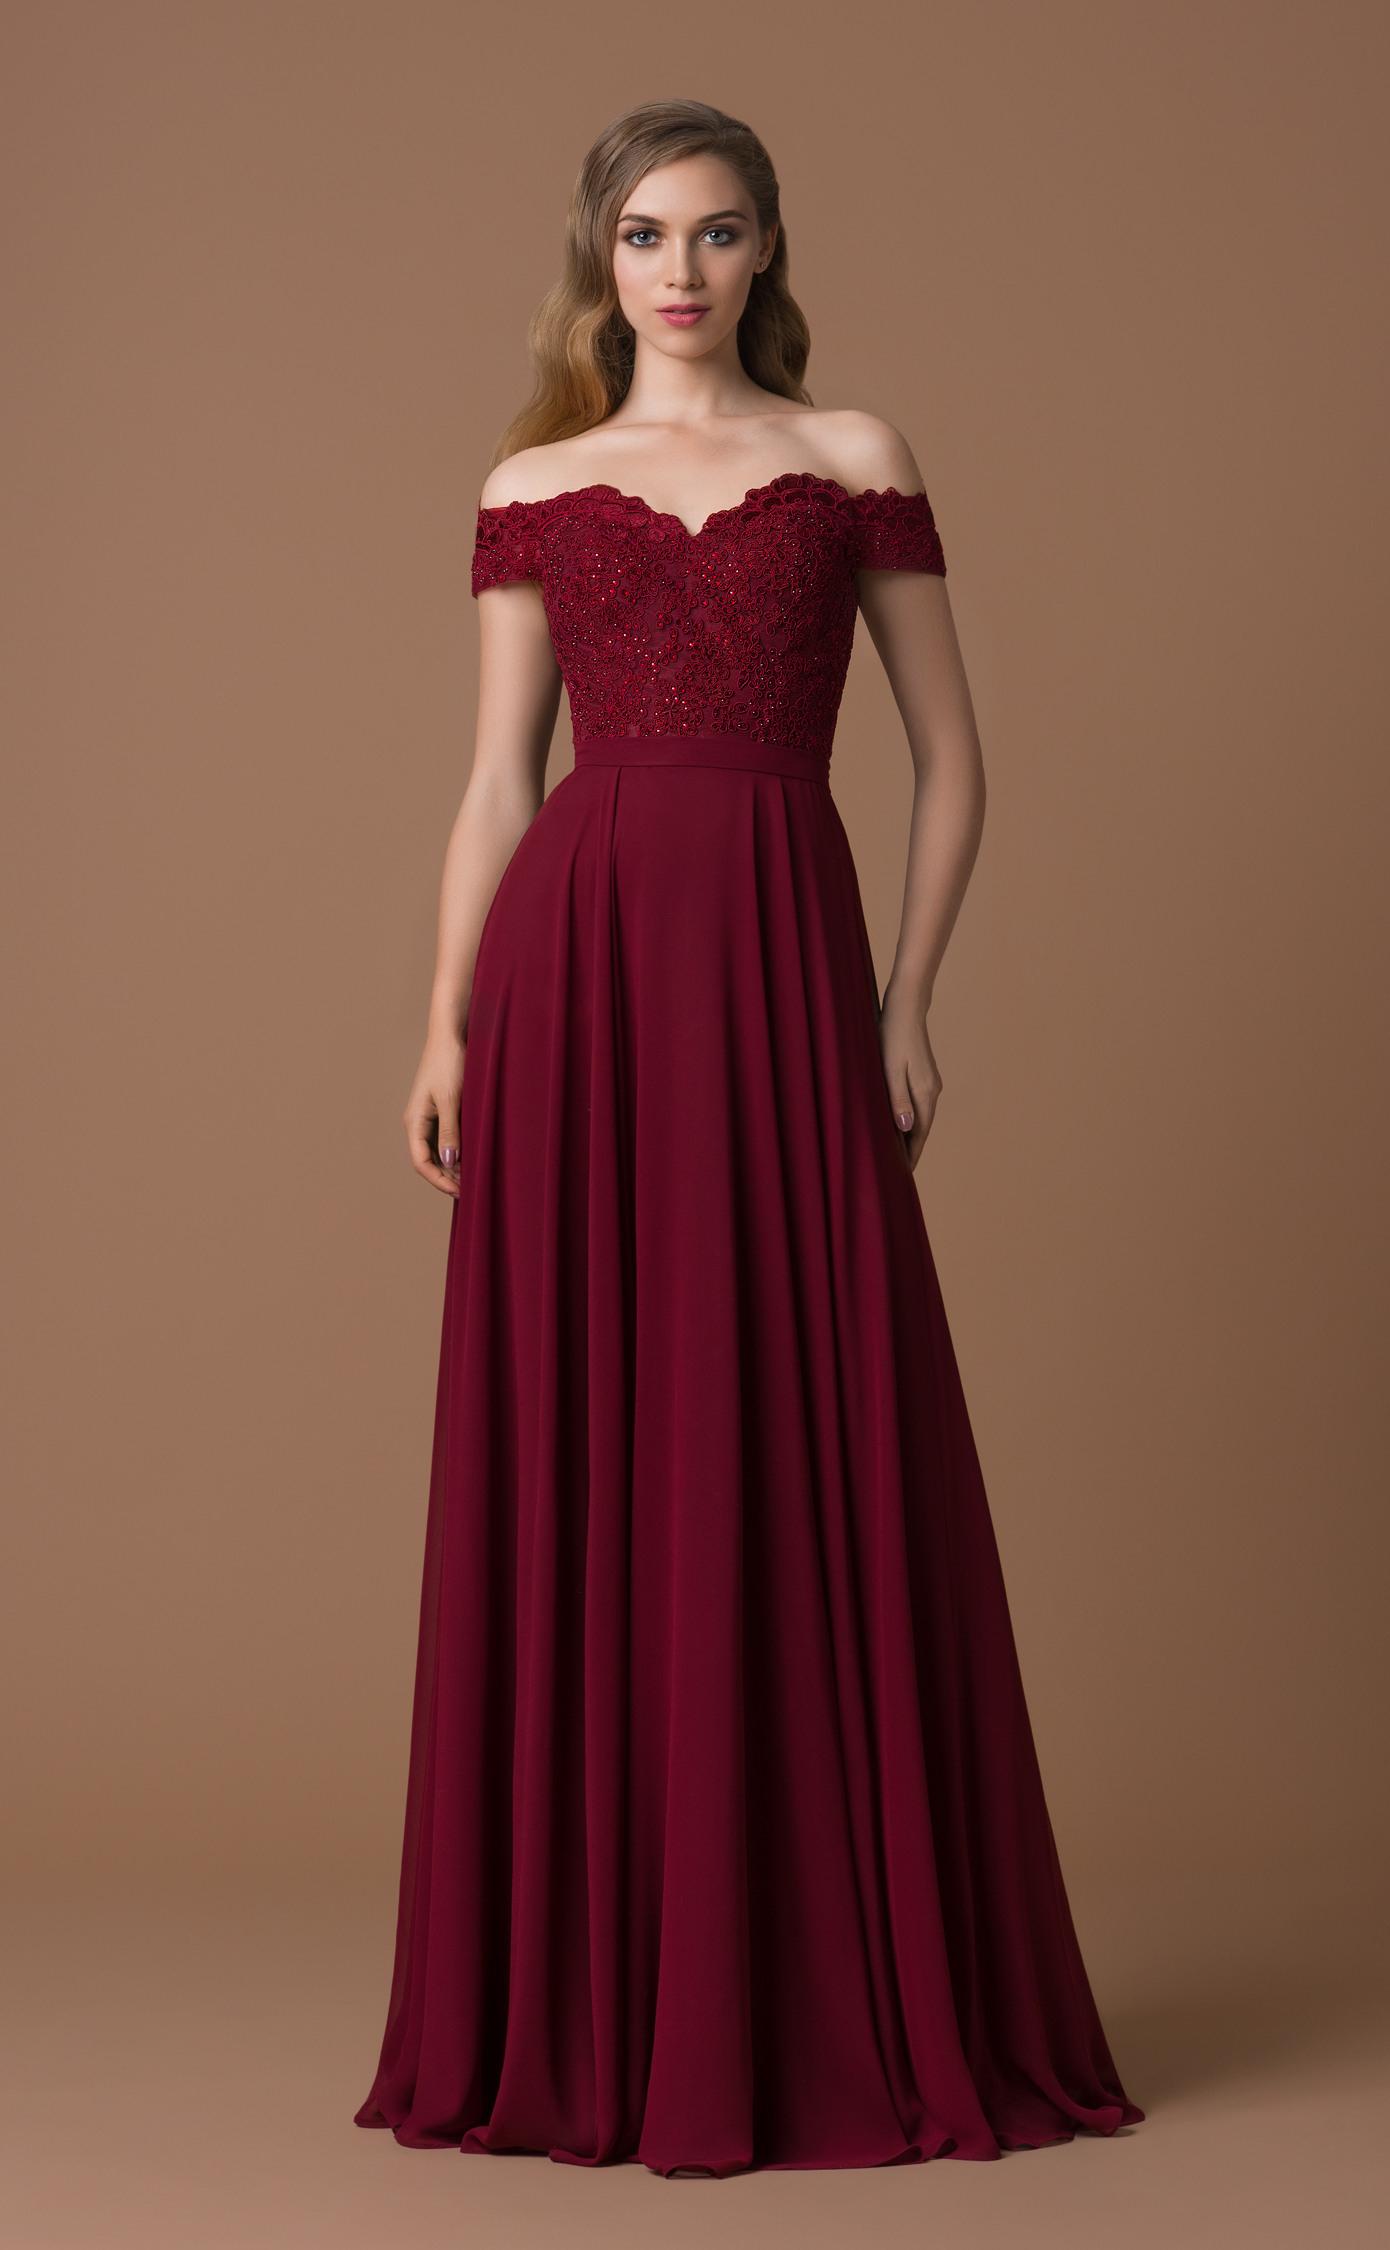 17 Luxurius Abendkleid Bordeaux Bester Preis20 Schön Abendkleid Bordeaux Galerie